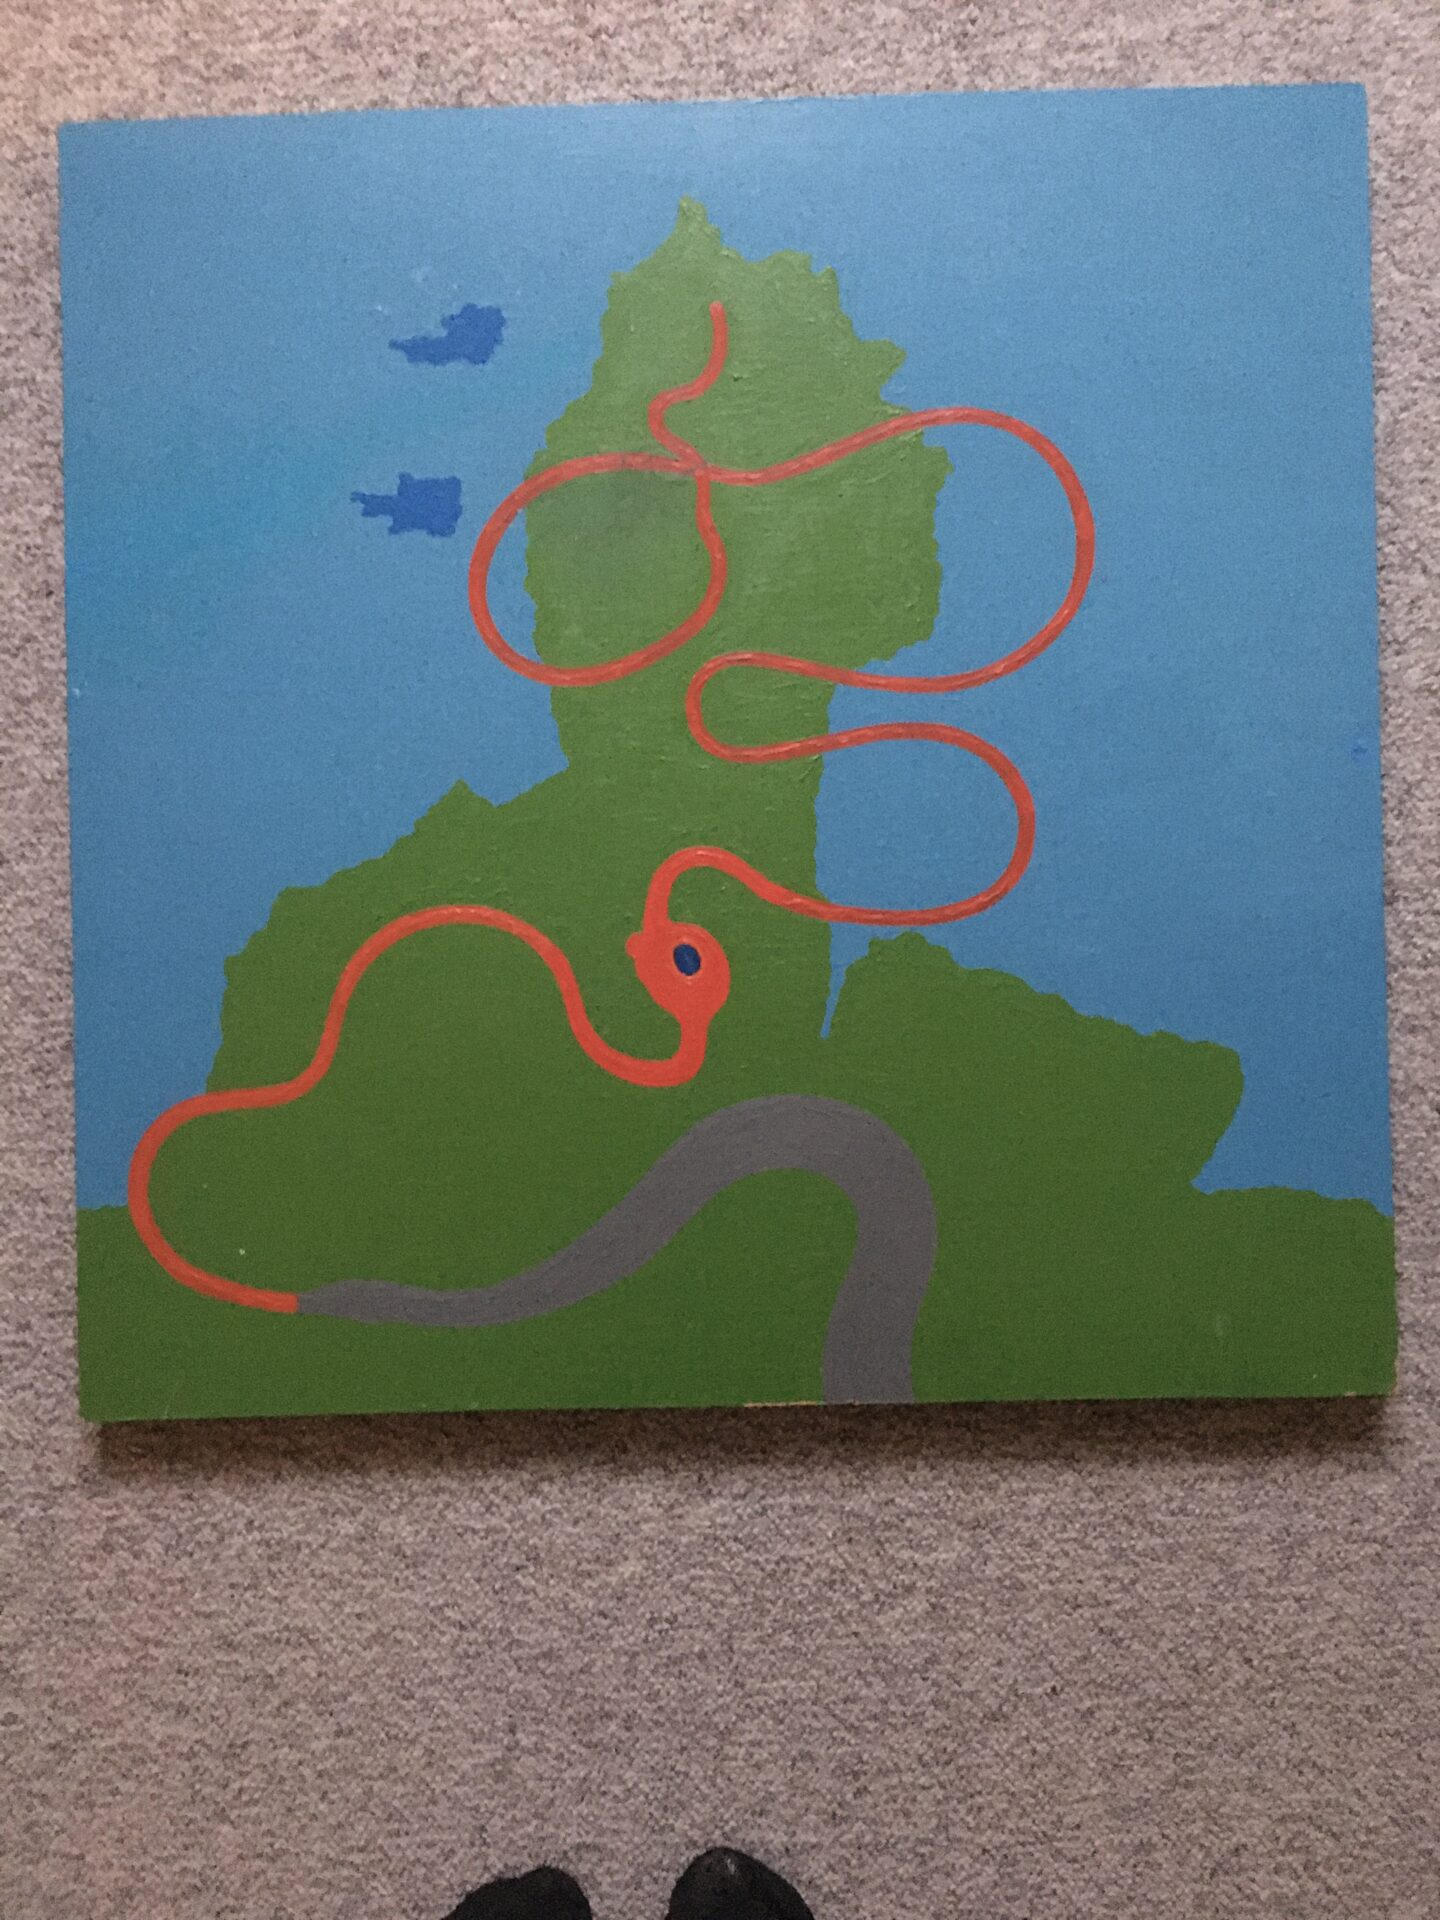 Poul Agger, maleri, plade opsat på ramme, 64x64 cm, pris 800kr